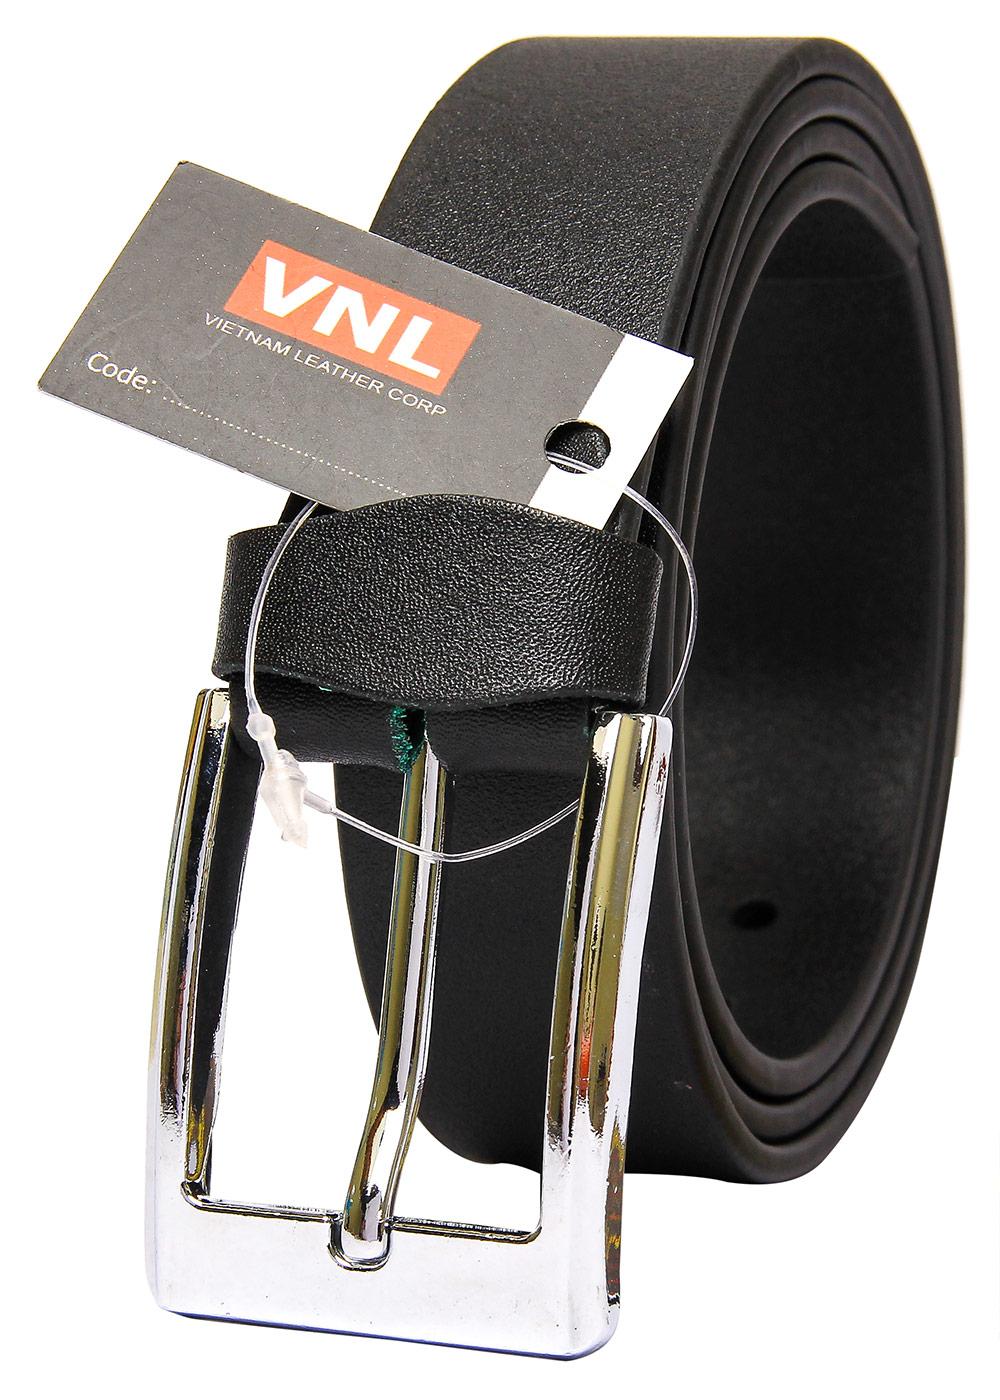 Thắt Lưng Nam Da Thật Cao Cấp Da Giày Việt Nam VNL0TK12D - Đen